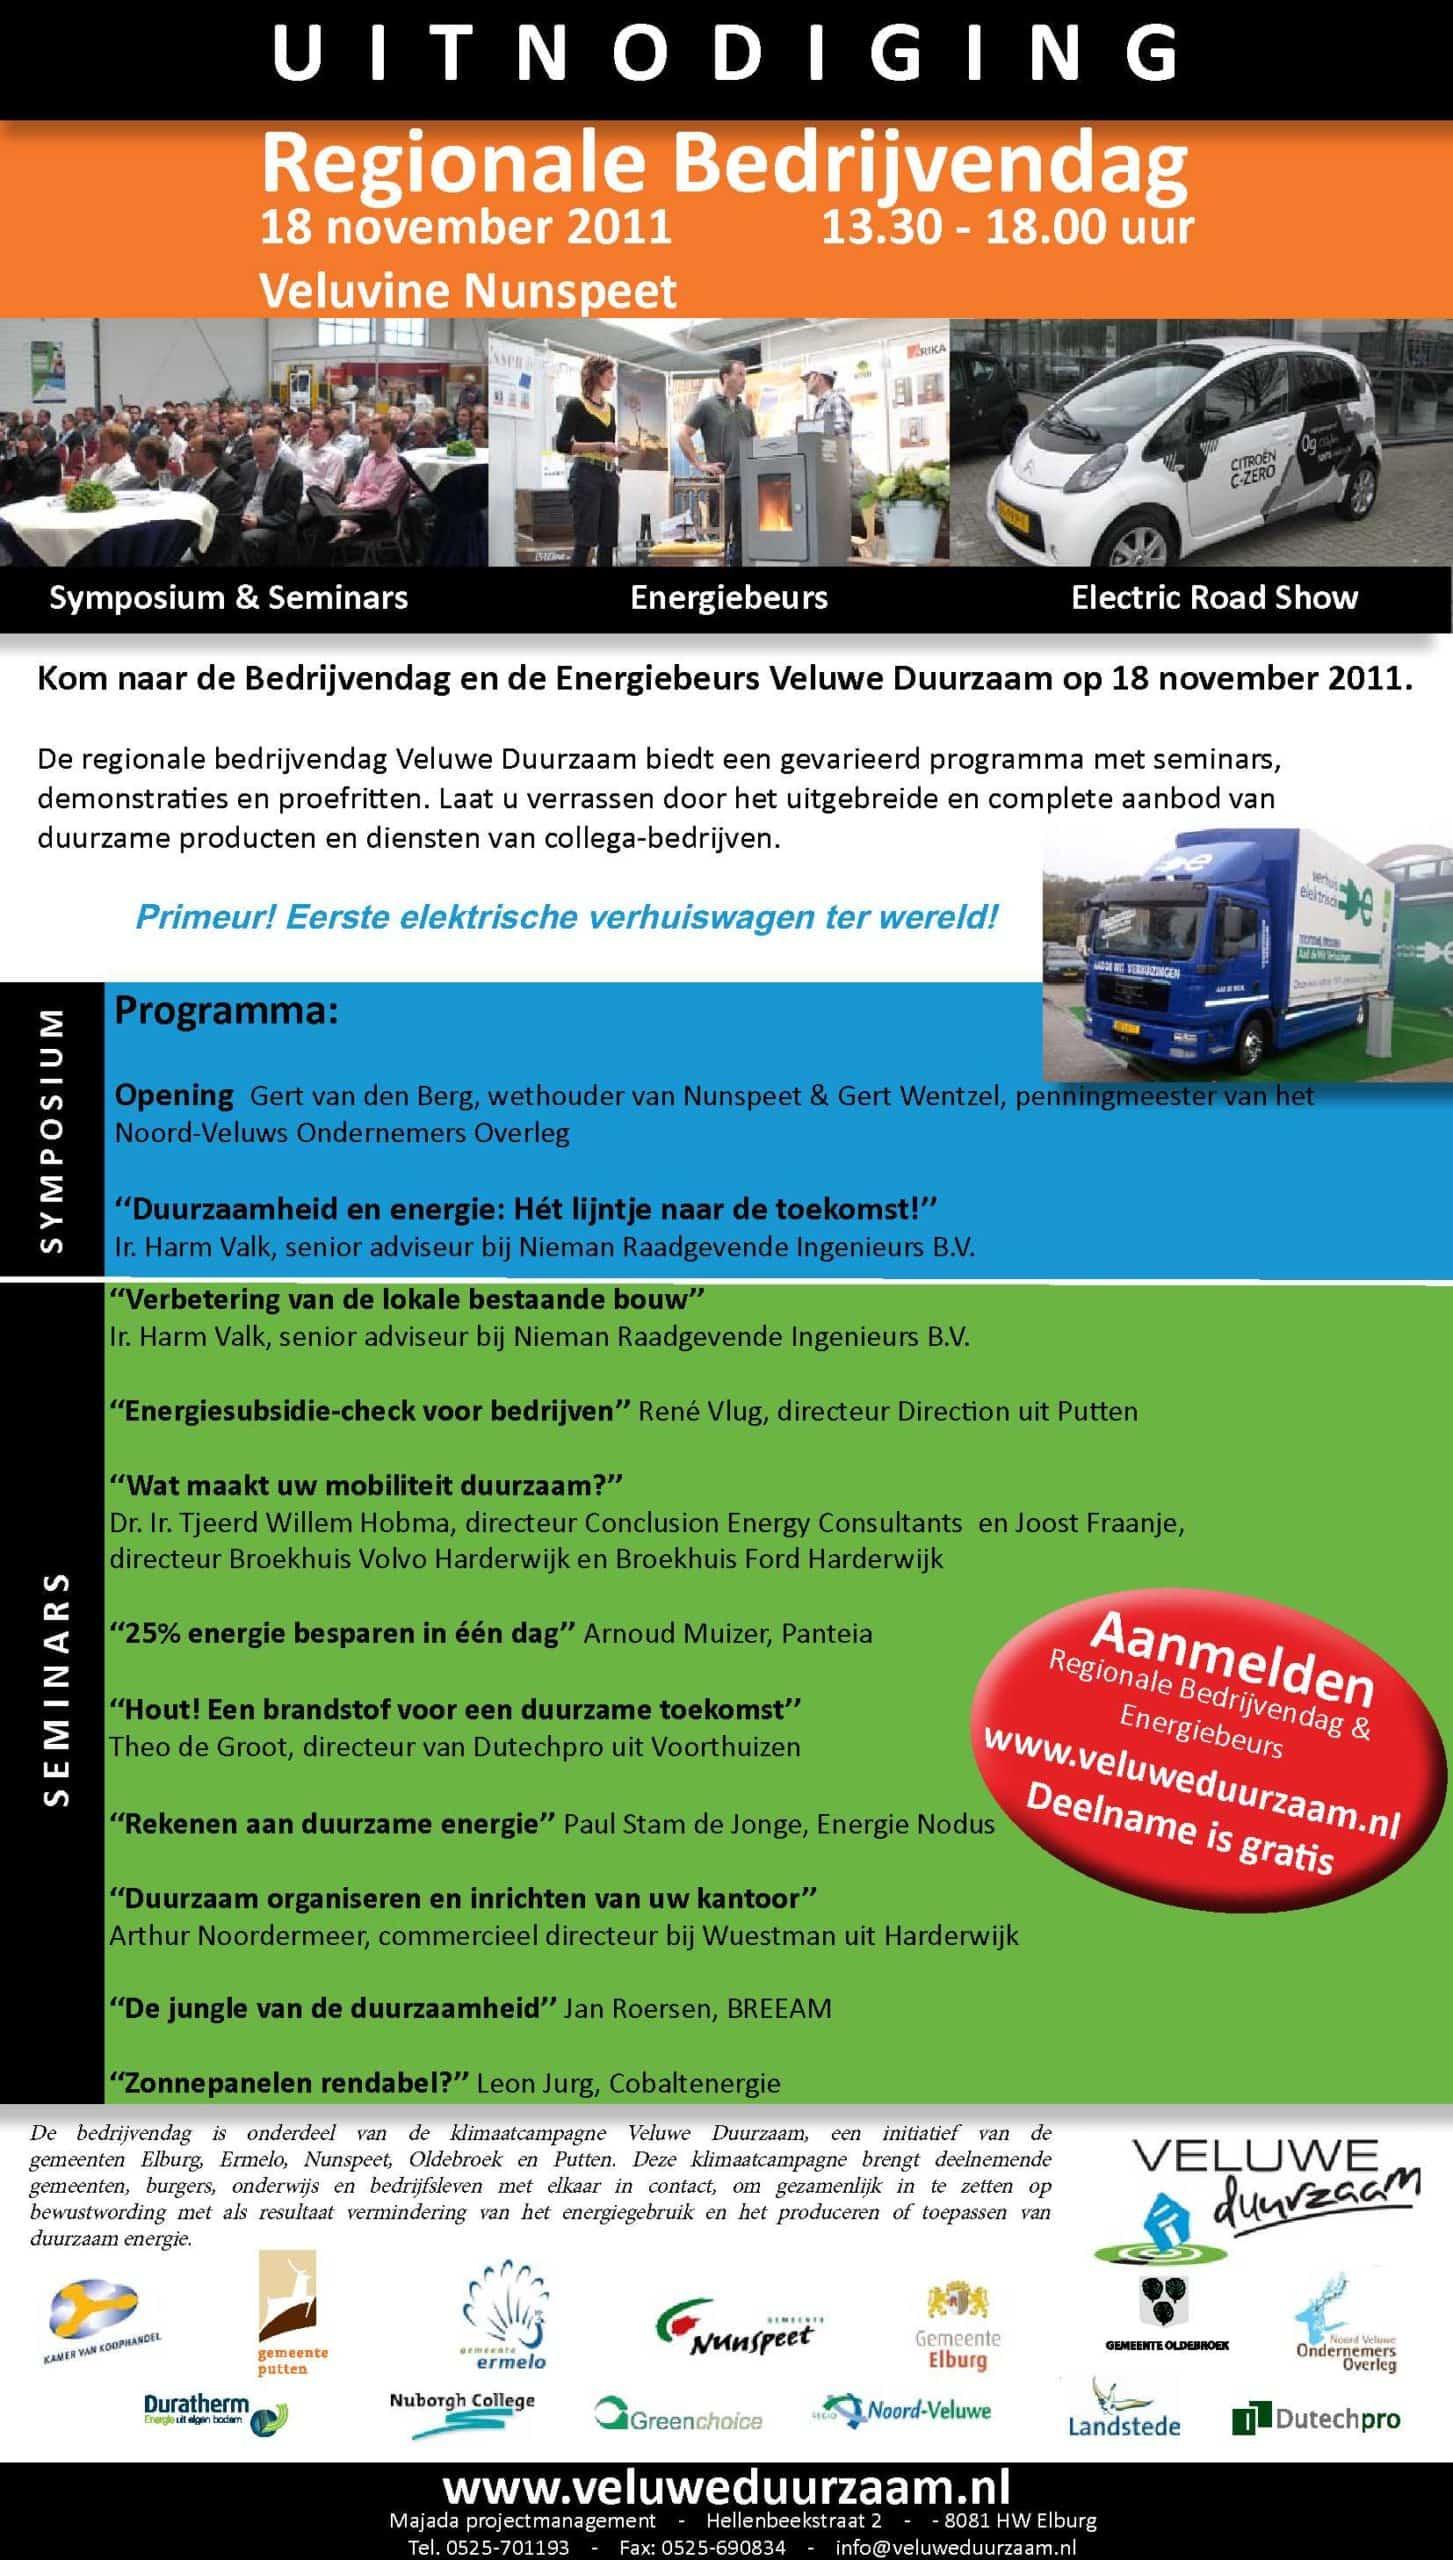 Programma Energiebeurs Veluwe Duurzaam - 18 november 2011